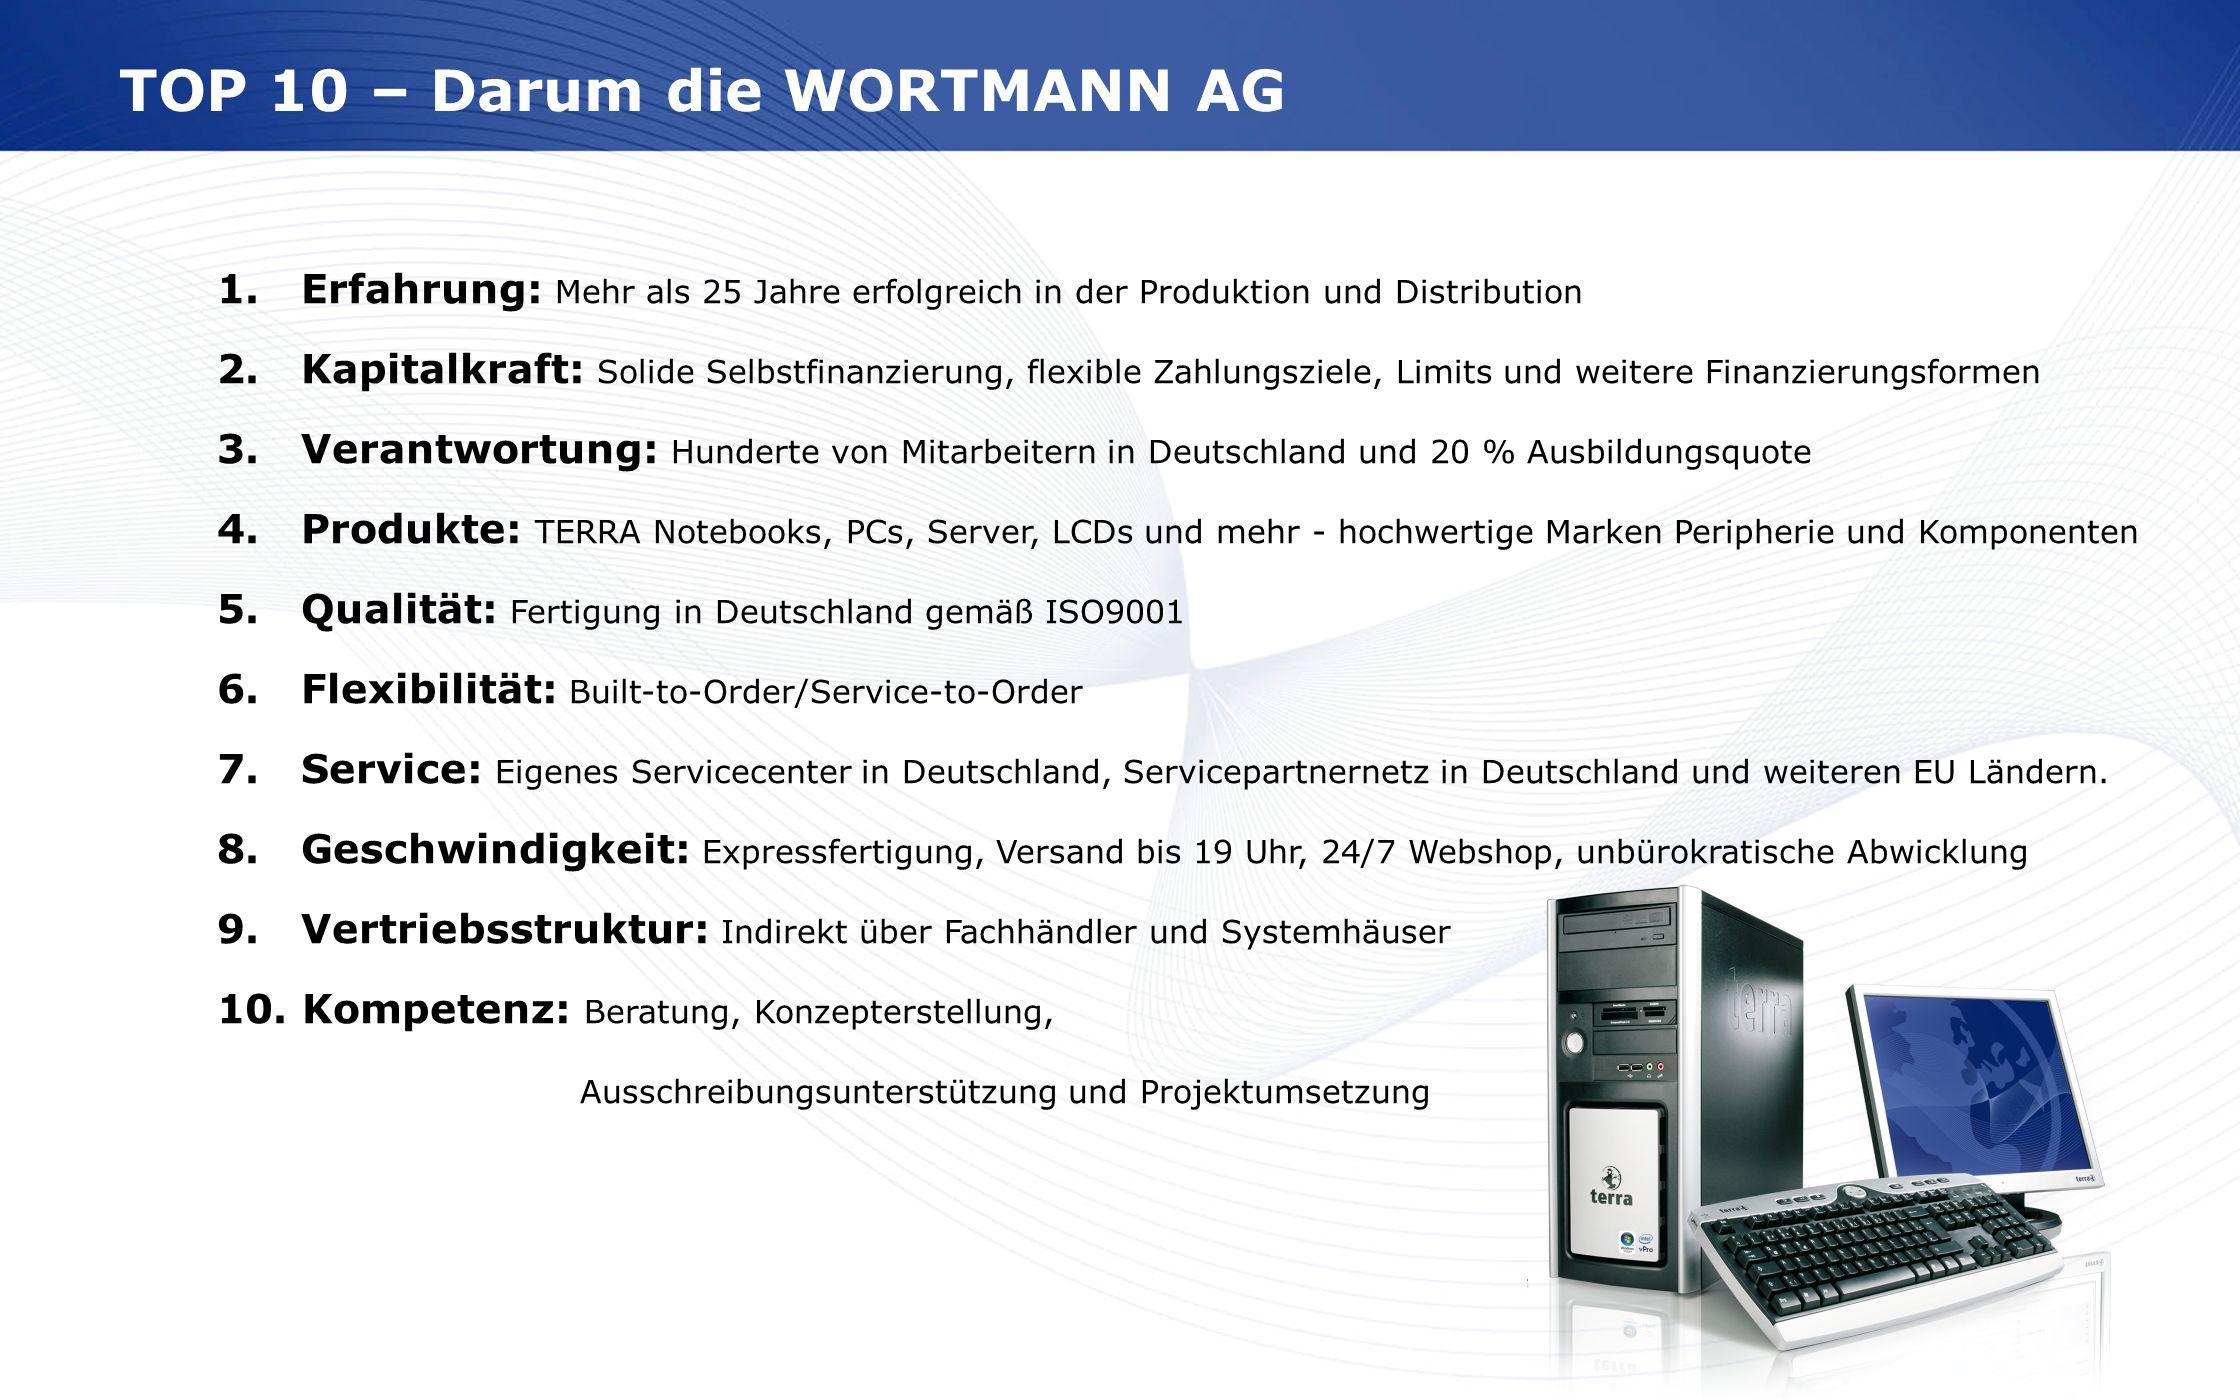 TOP 10 – Darum die WORTMANN AG